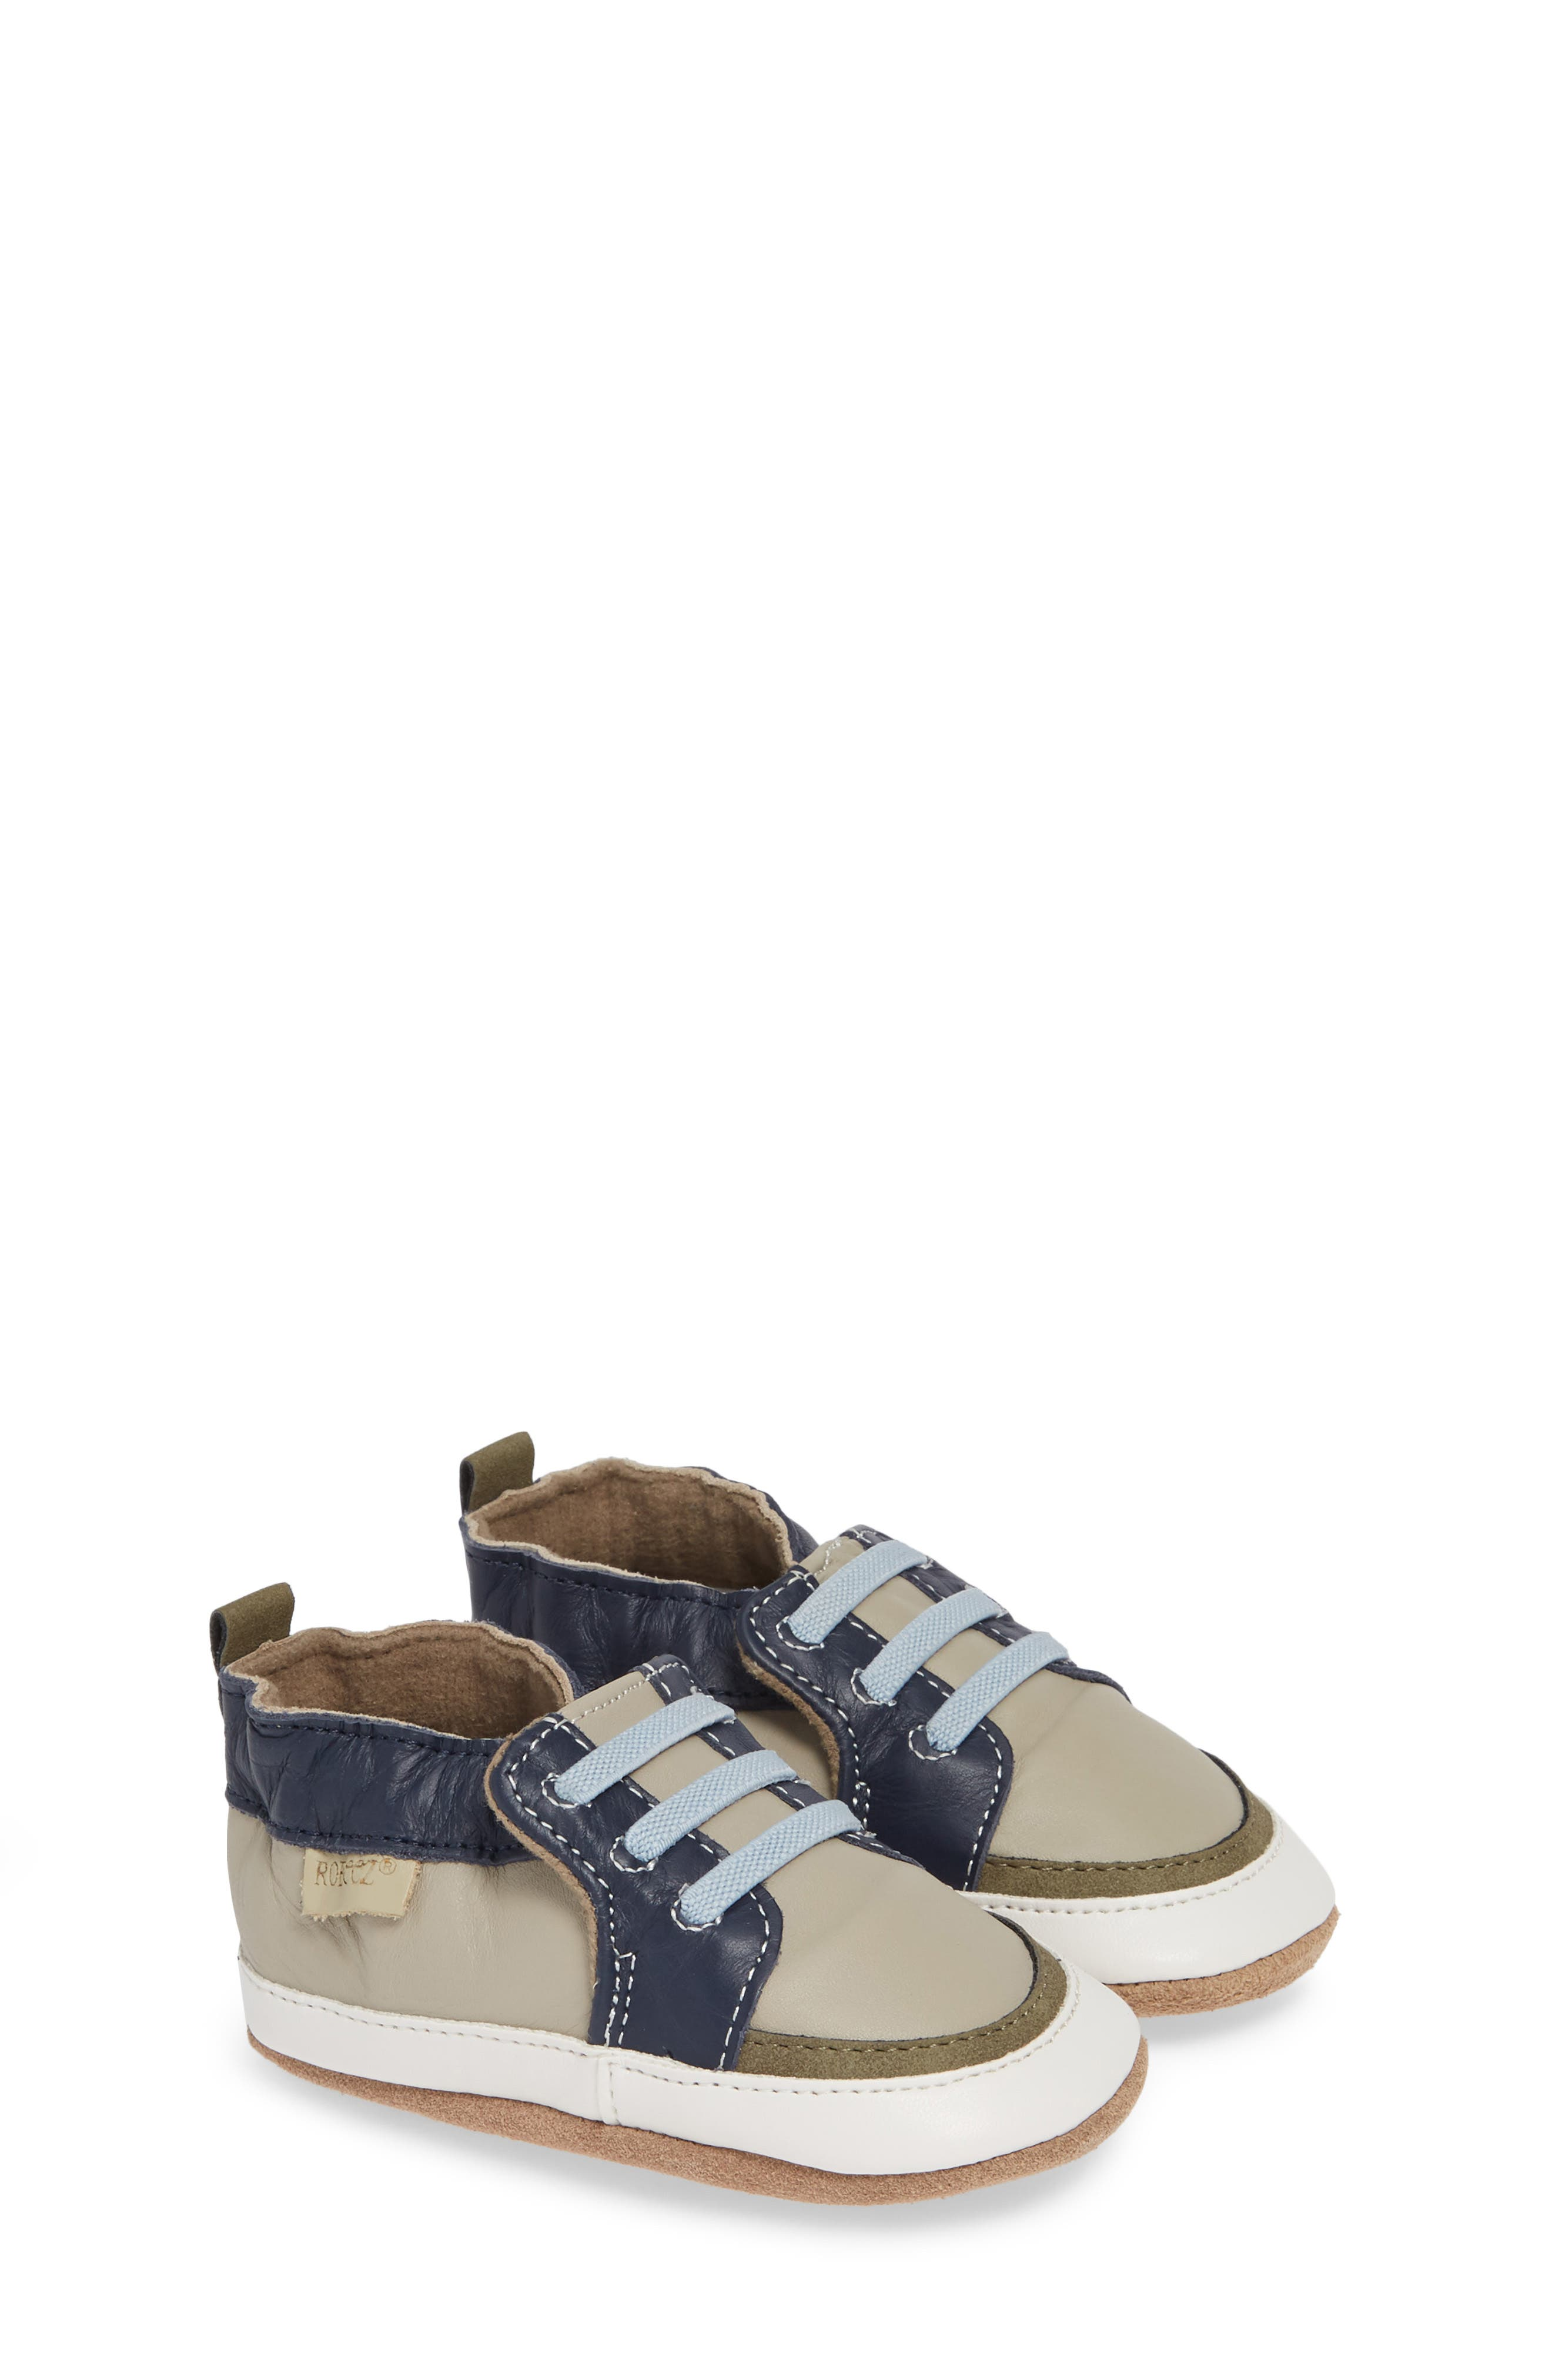 Arthur Trendy Trainer Crib Shoe, Main, color, GREY